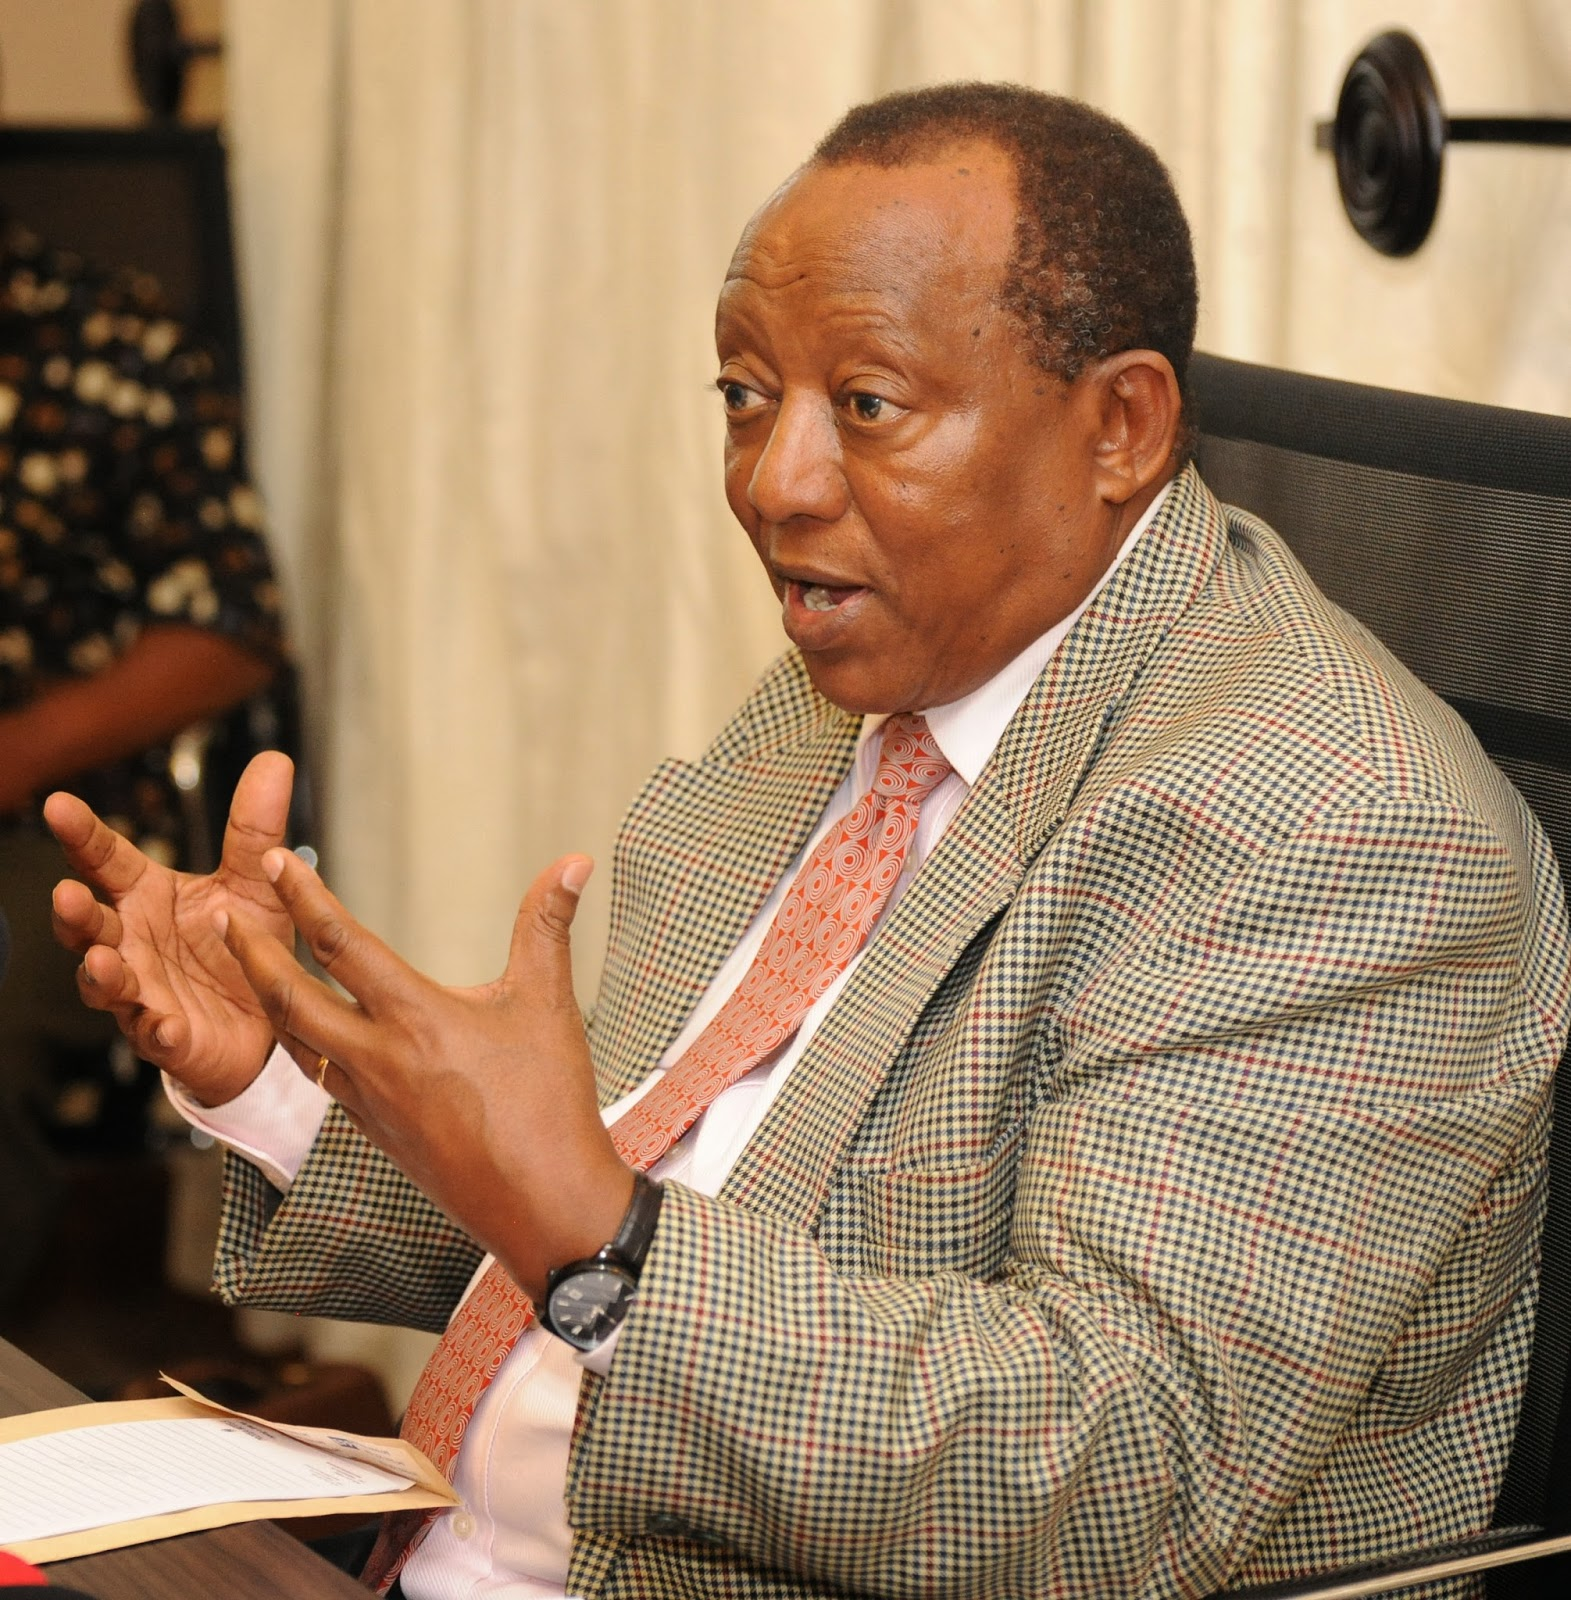 Sumaye ahamishiwa Muhimbili, Mbowe atoa neno